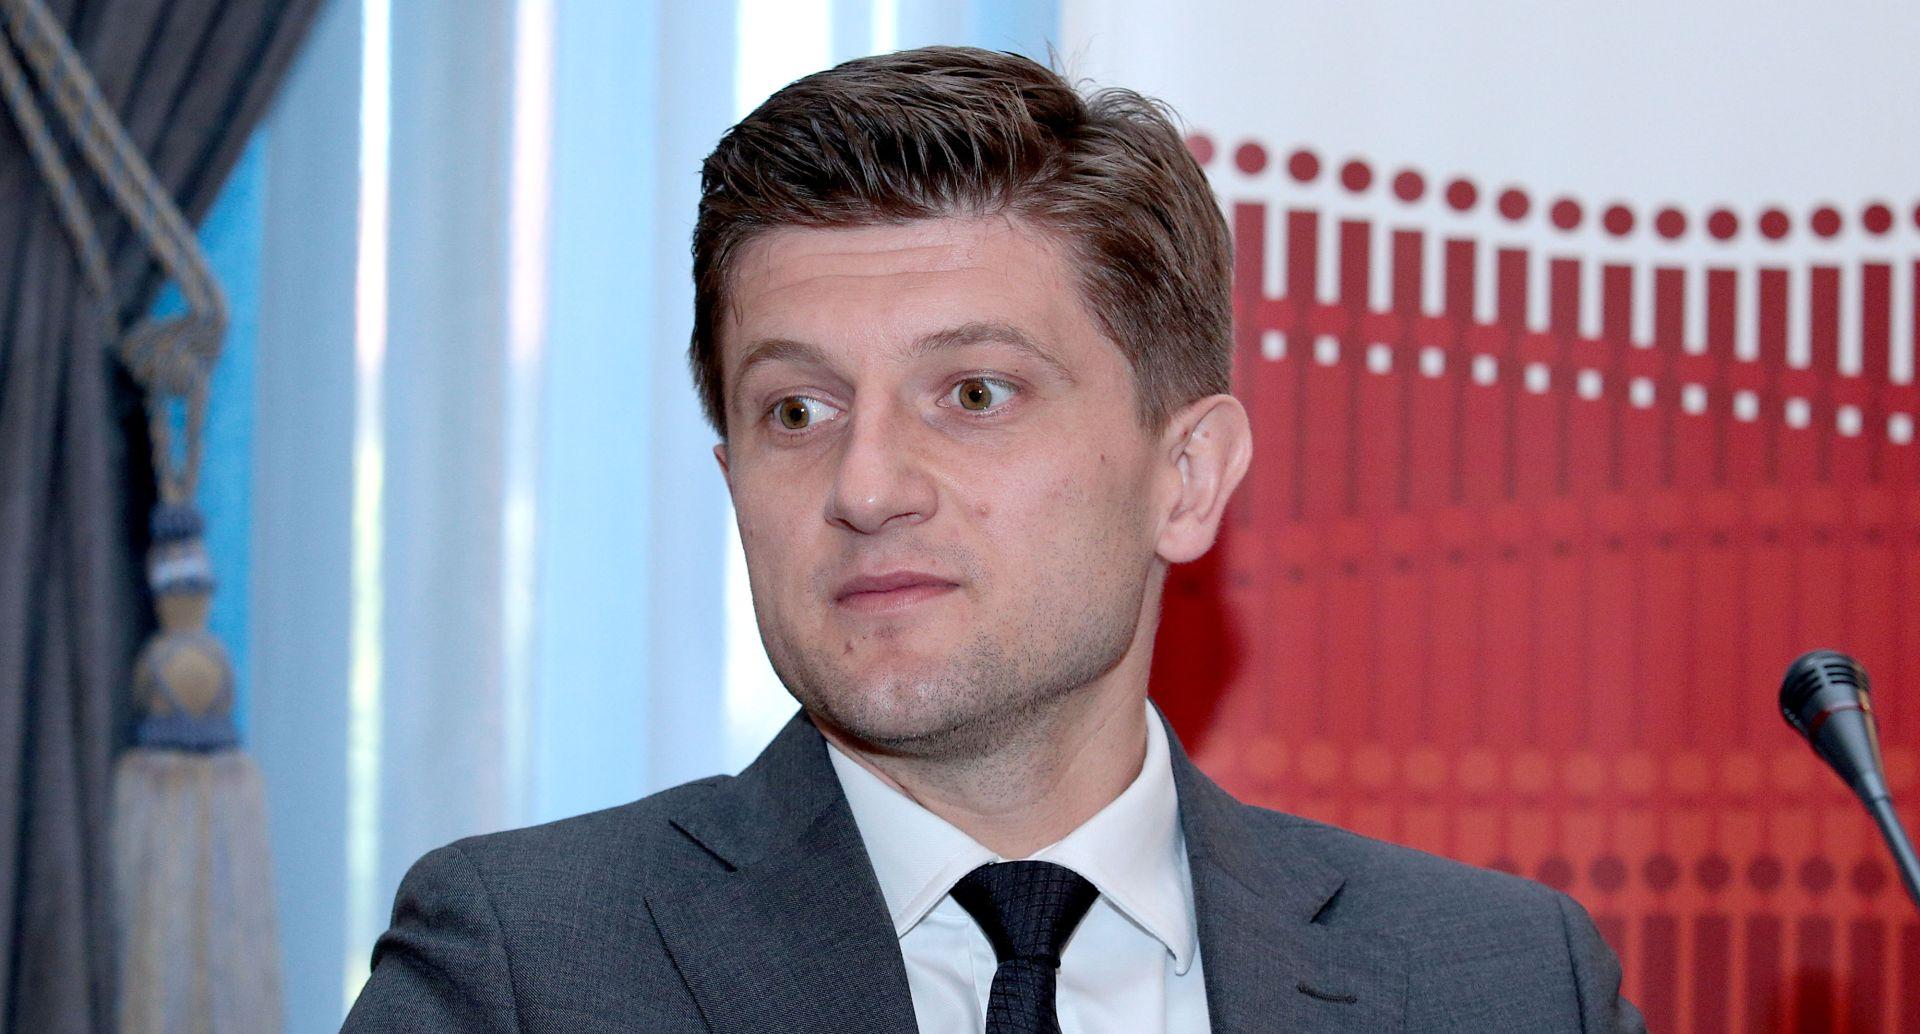 Ministarstvo financija izdalo 1,5 milijardi eura trezorskih zapisa